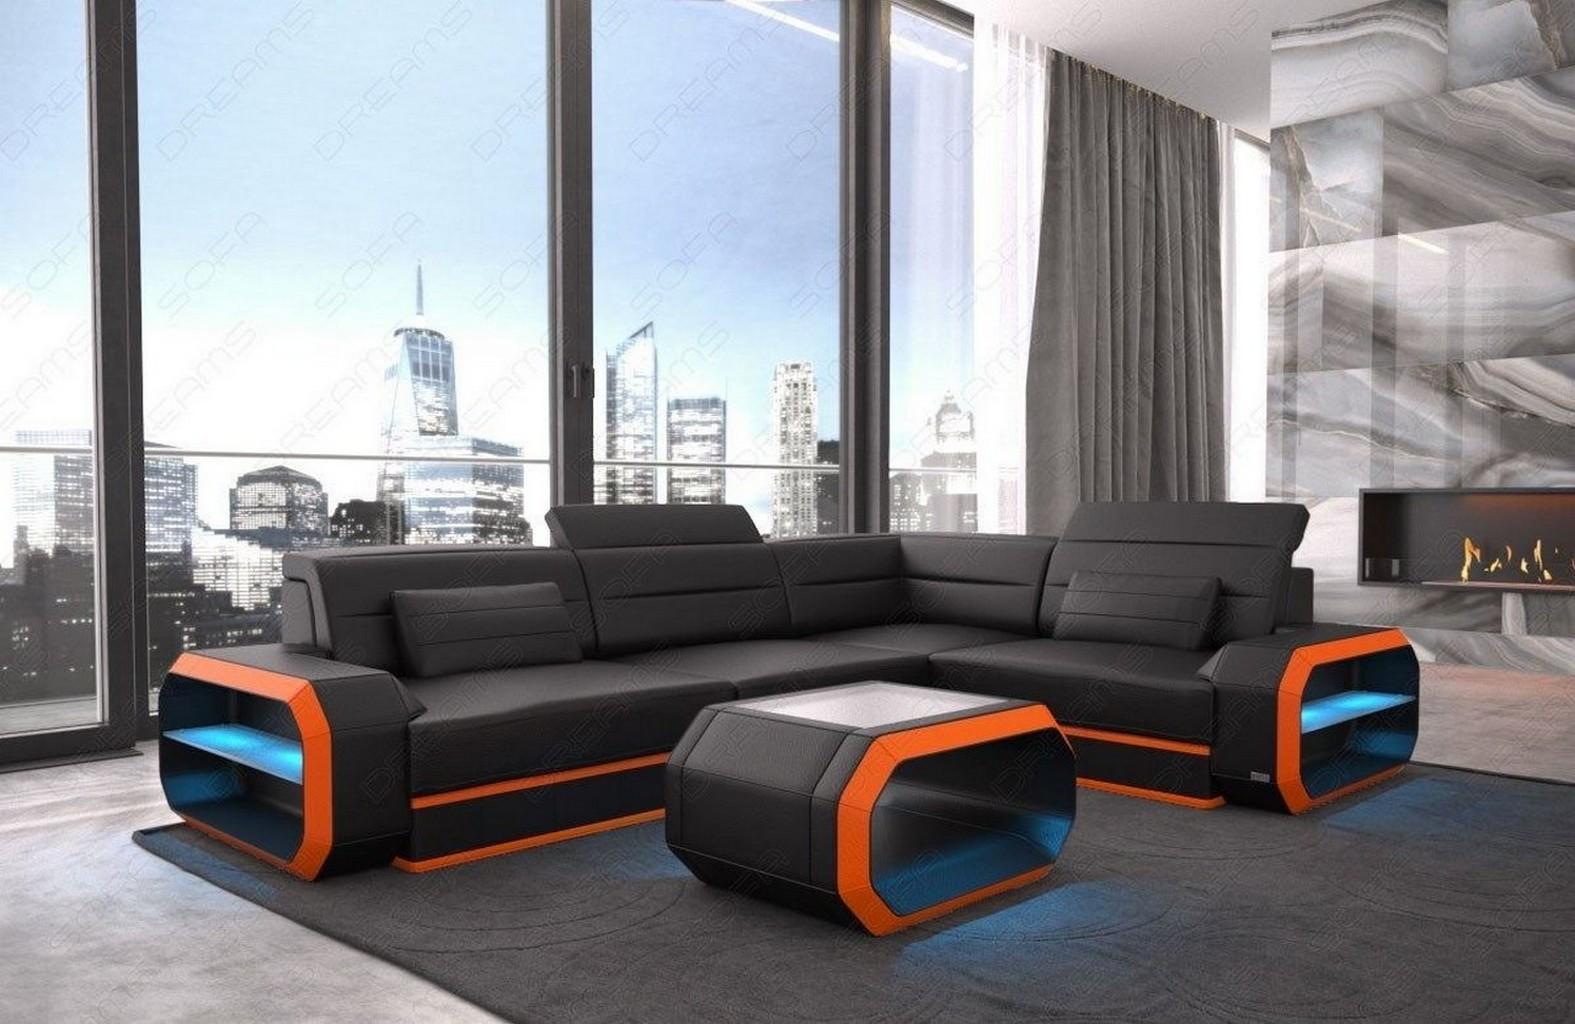 echt ledercouch designersofa verona l form eck couch mit. Black Bedroom Furniture Sets. Home Design Ideas